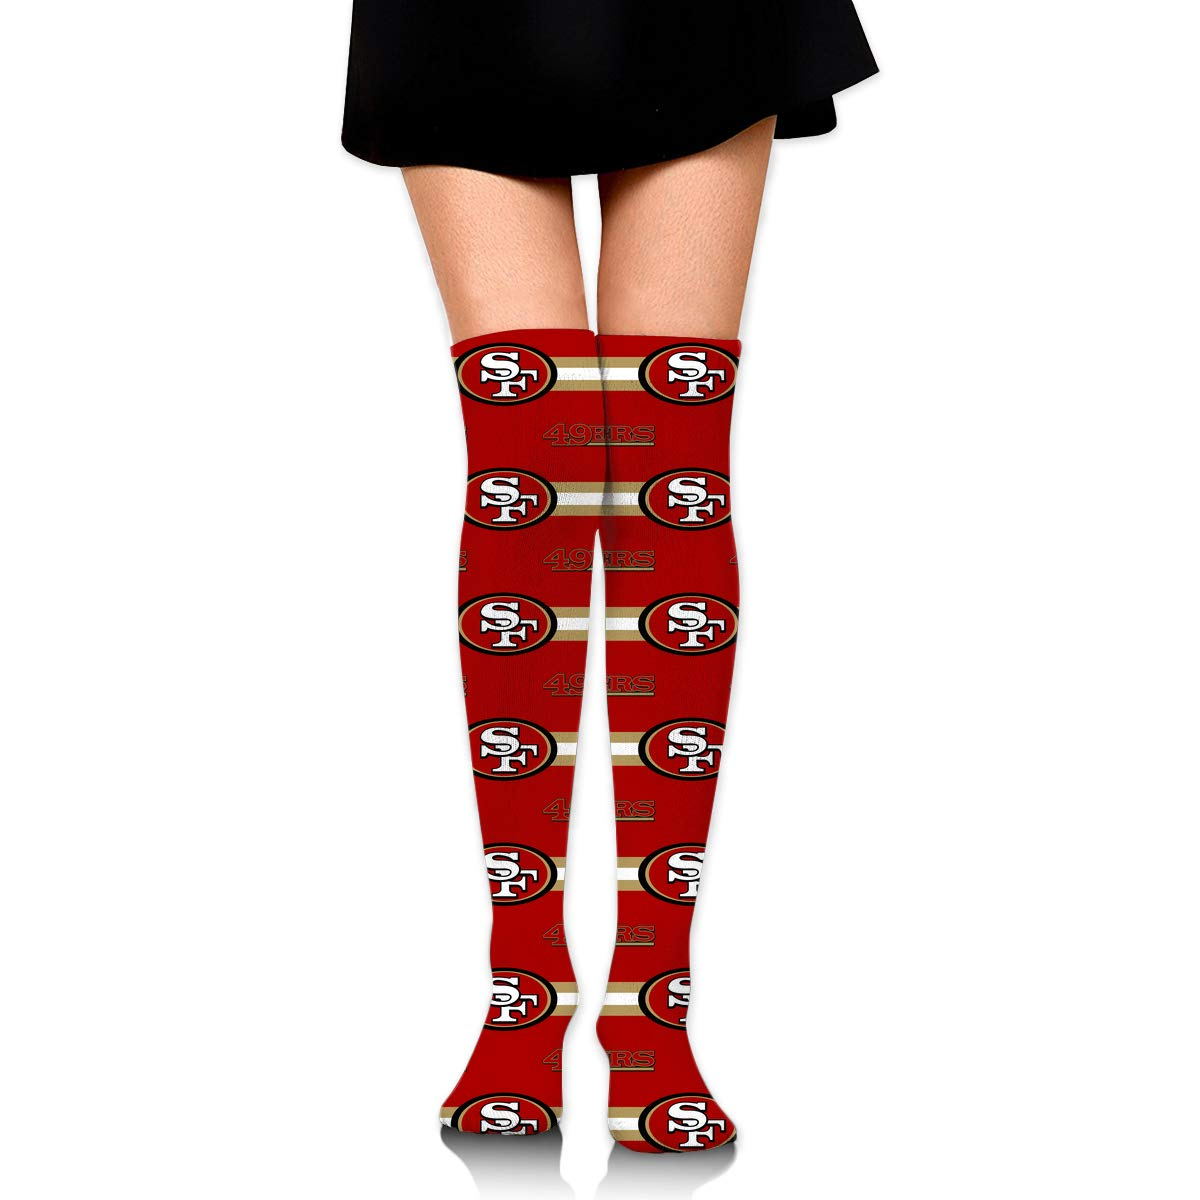 Sorcerer Custom Girls Over Knee High Boot Stockings Leg Warmers San Francisco 49ers Women's Polyester Thigh High Socks Gift by Sorcerer